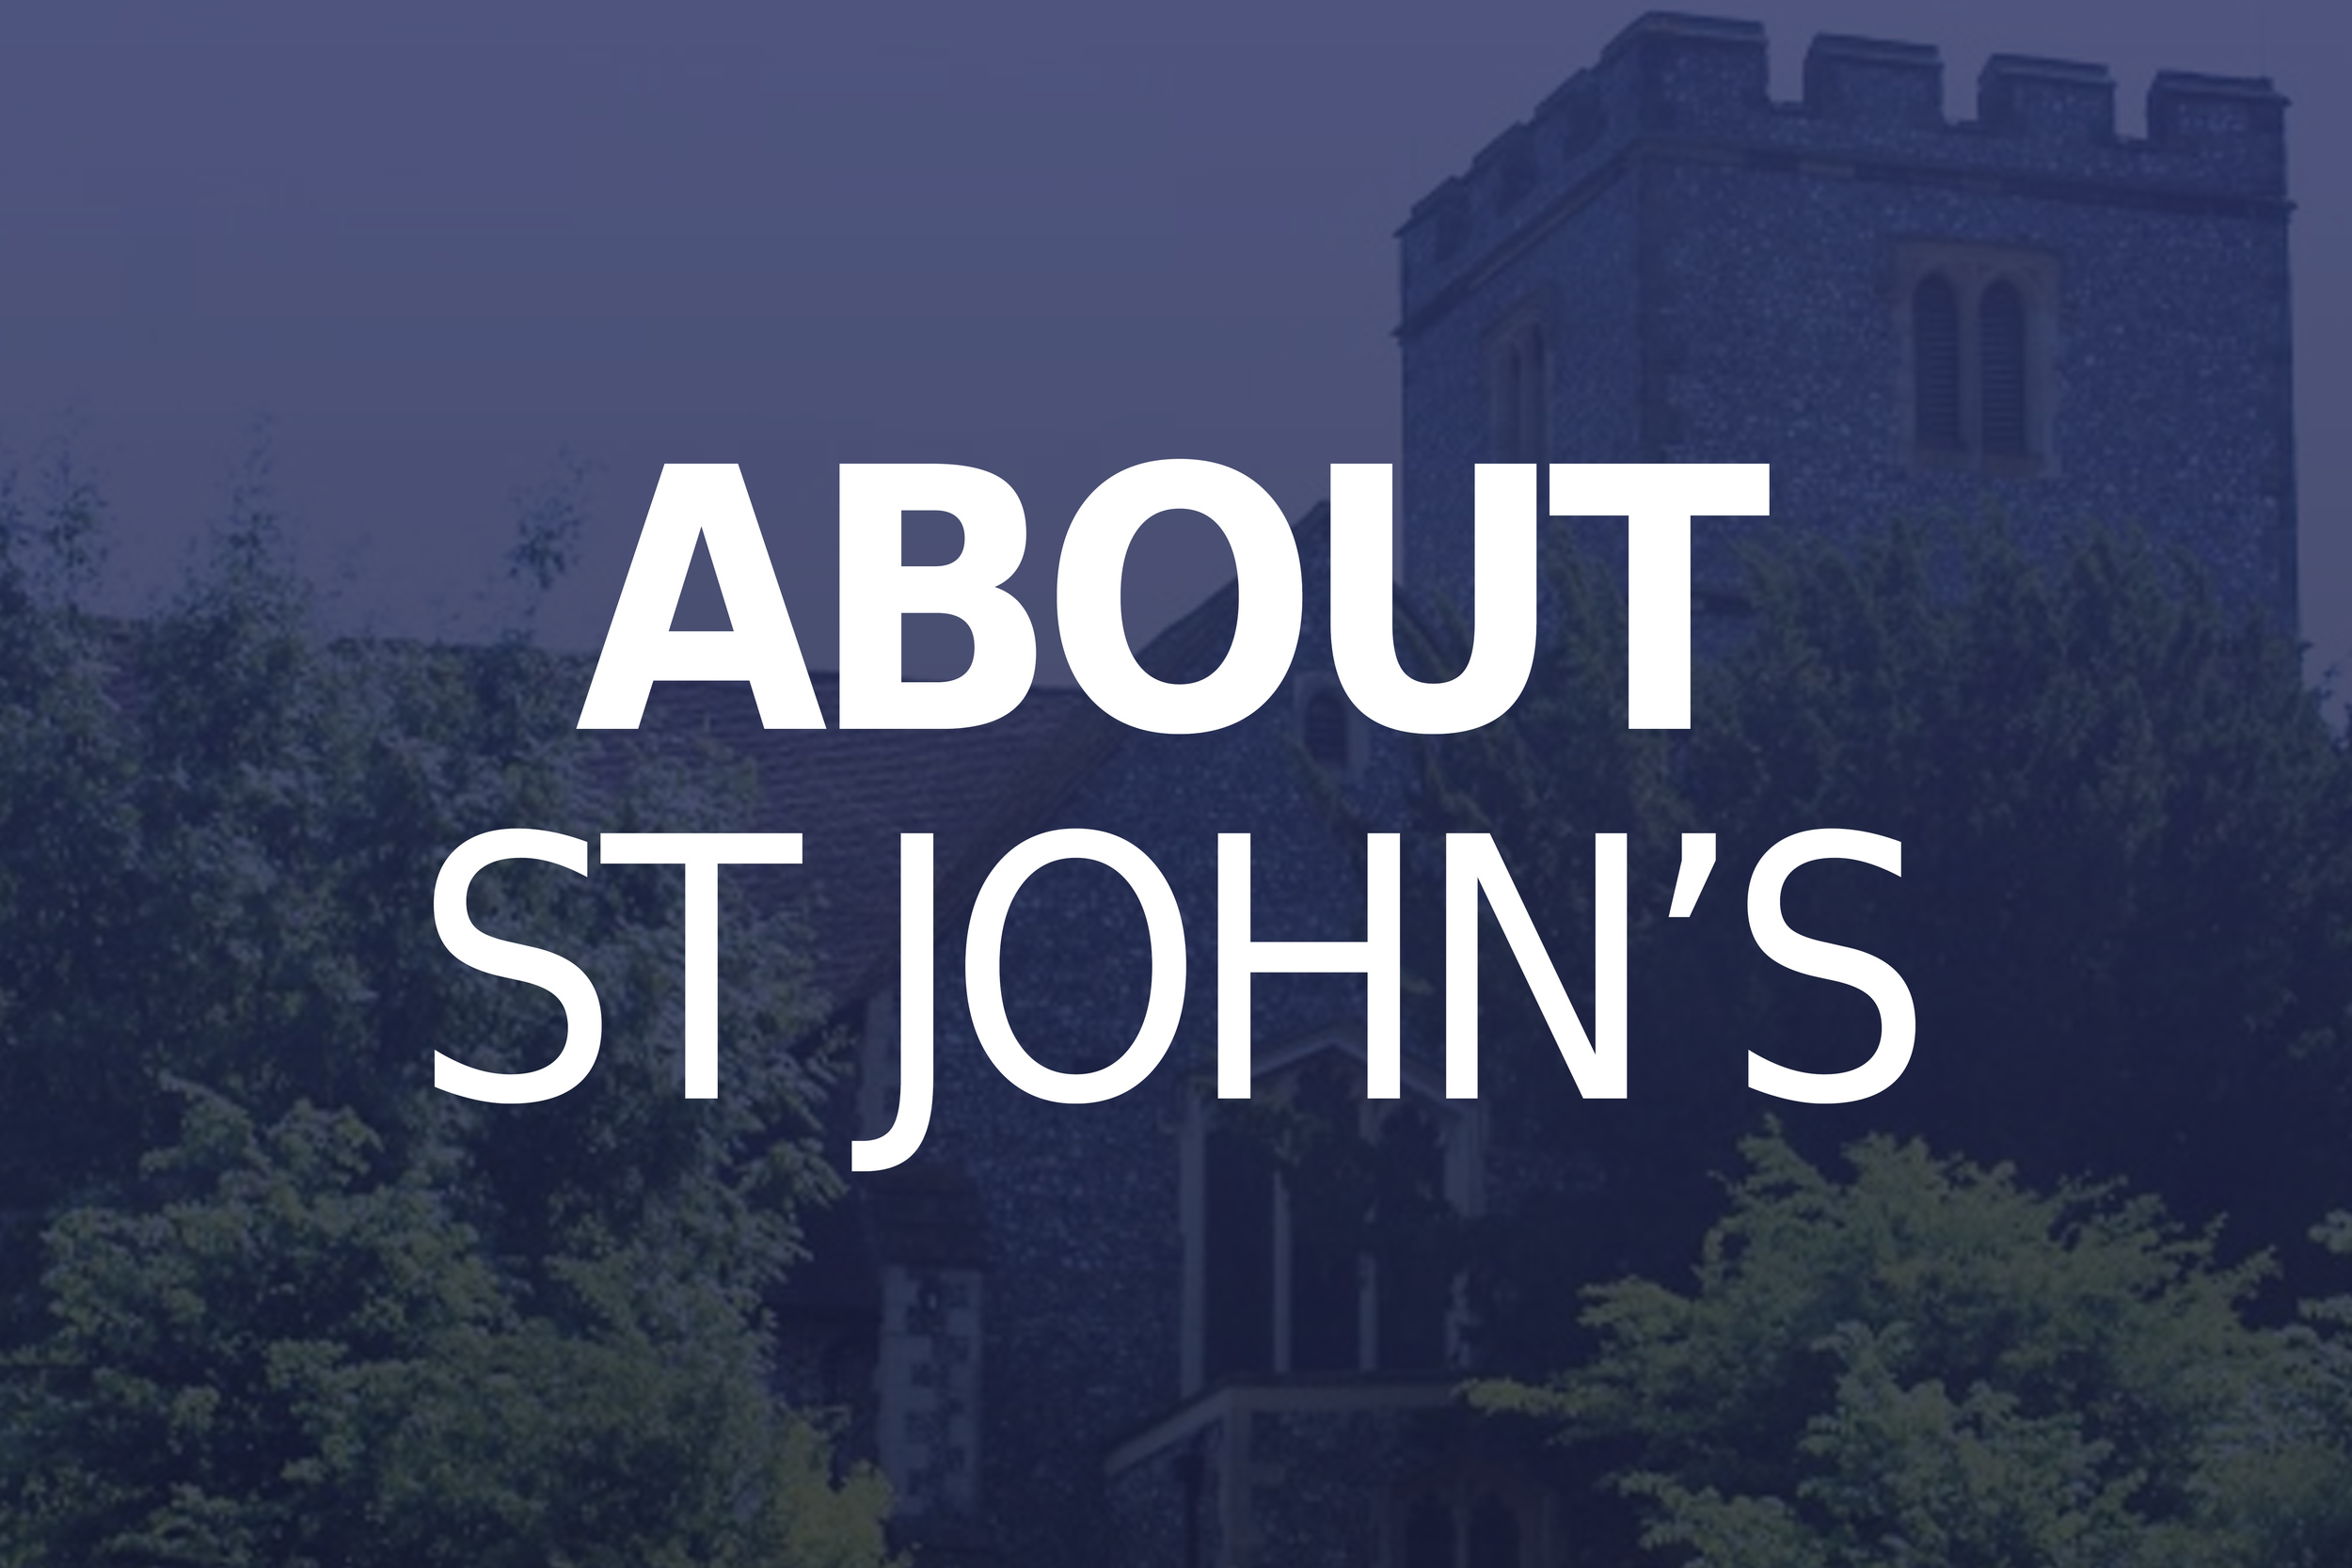 About-St-John's.jpg